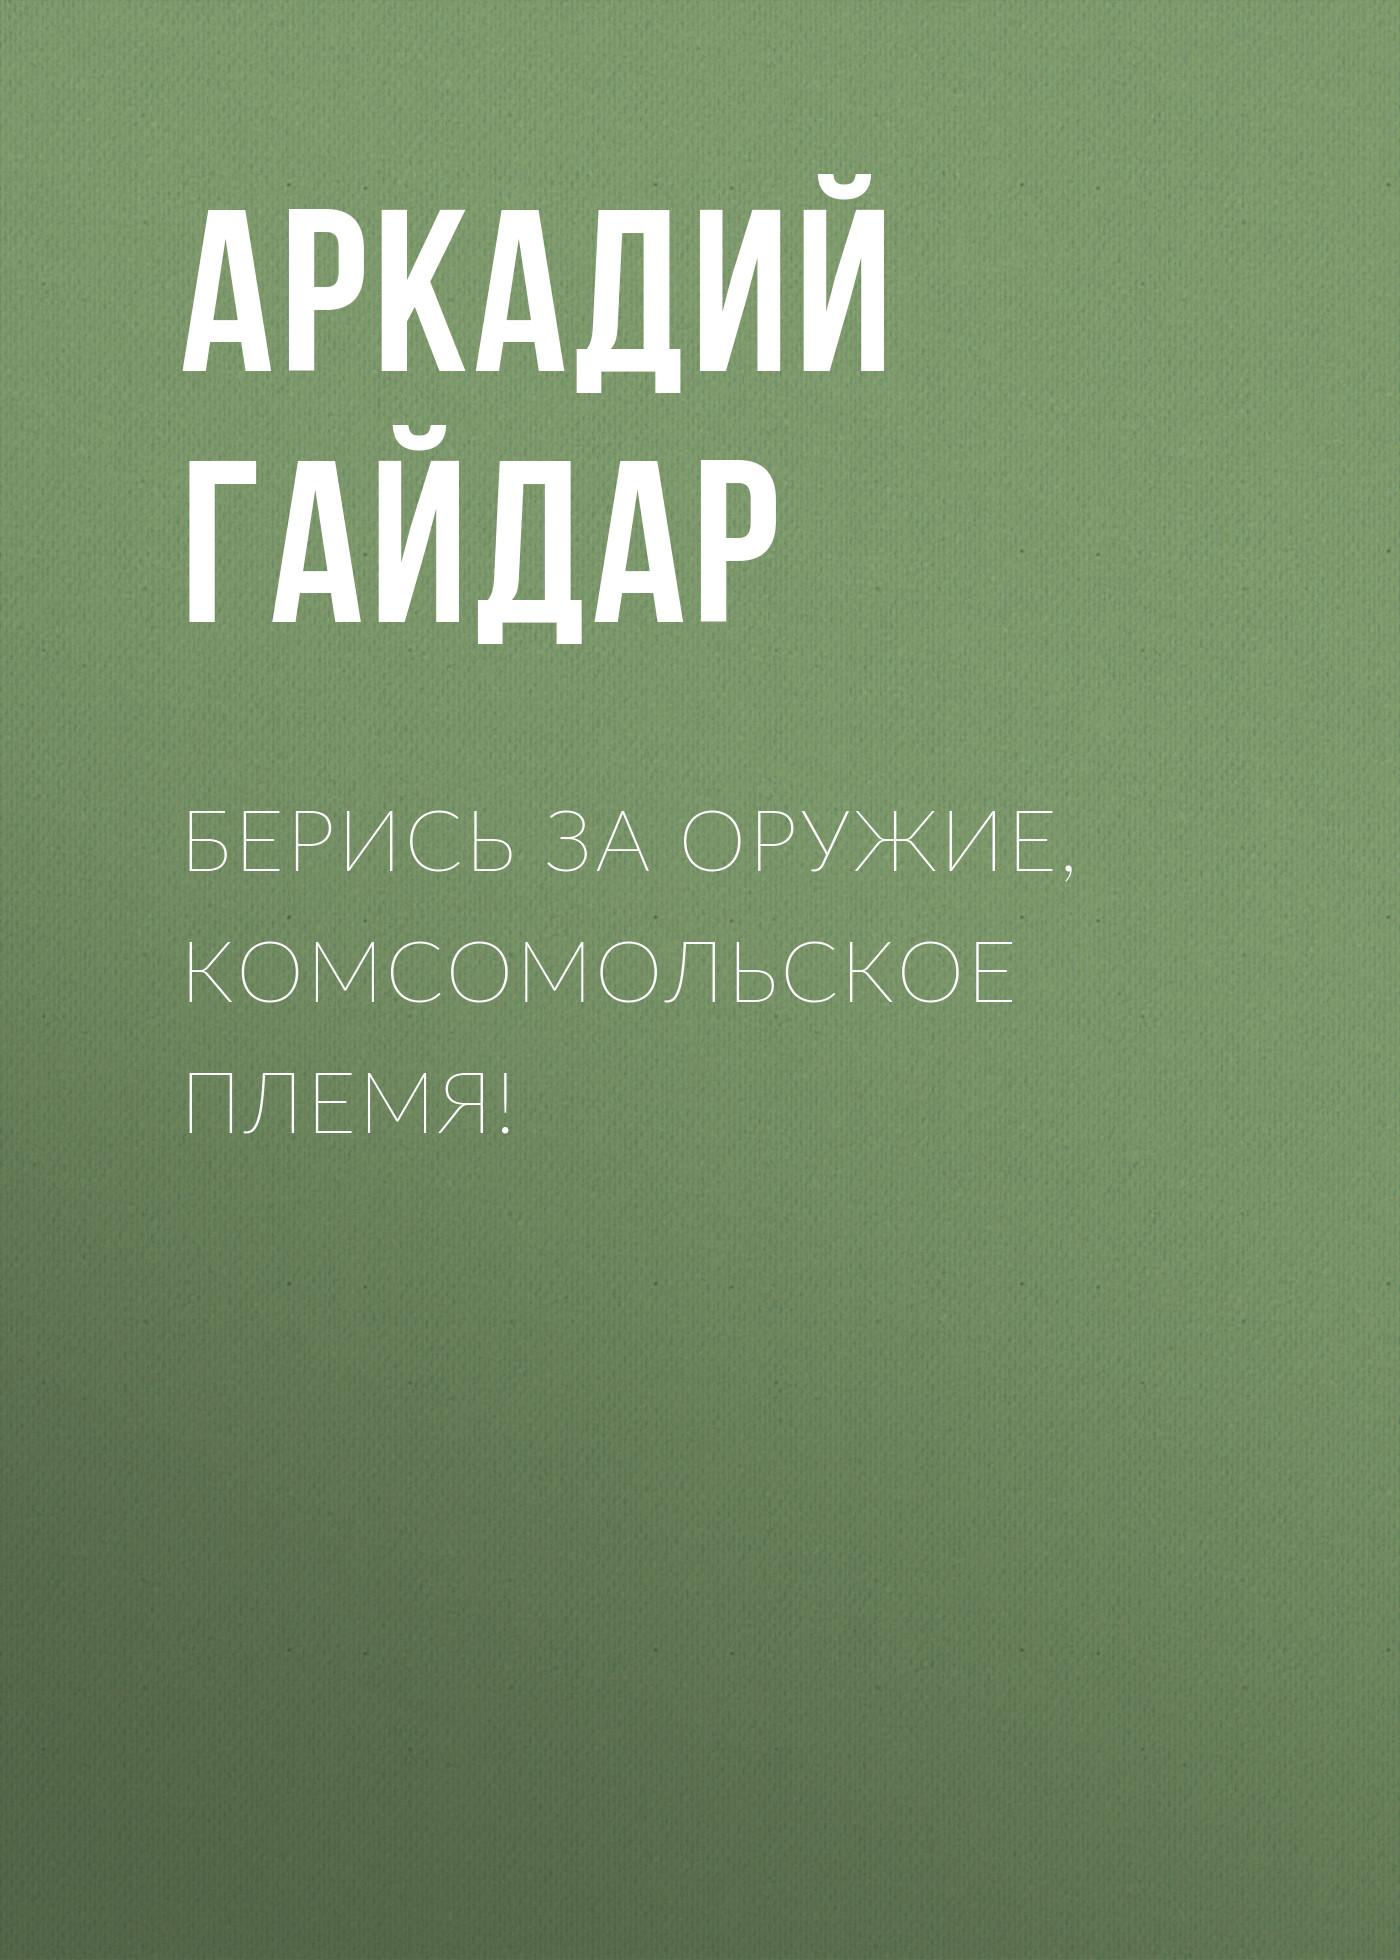 beris za oruzhie komsomolskoe plemya